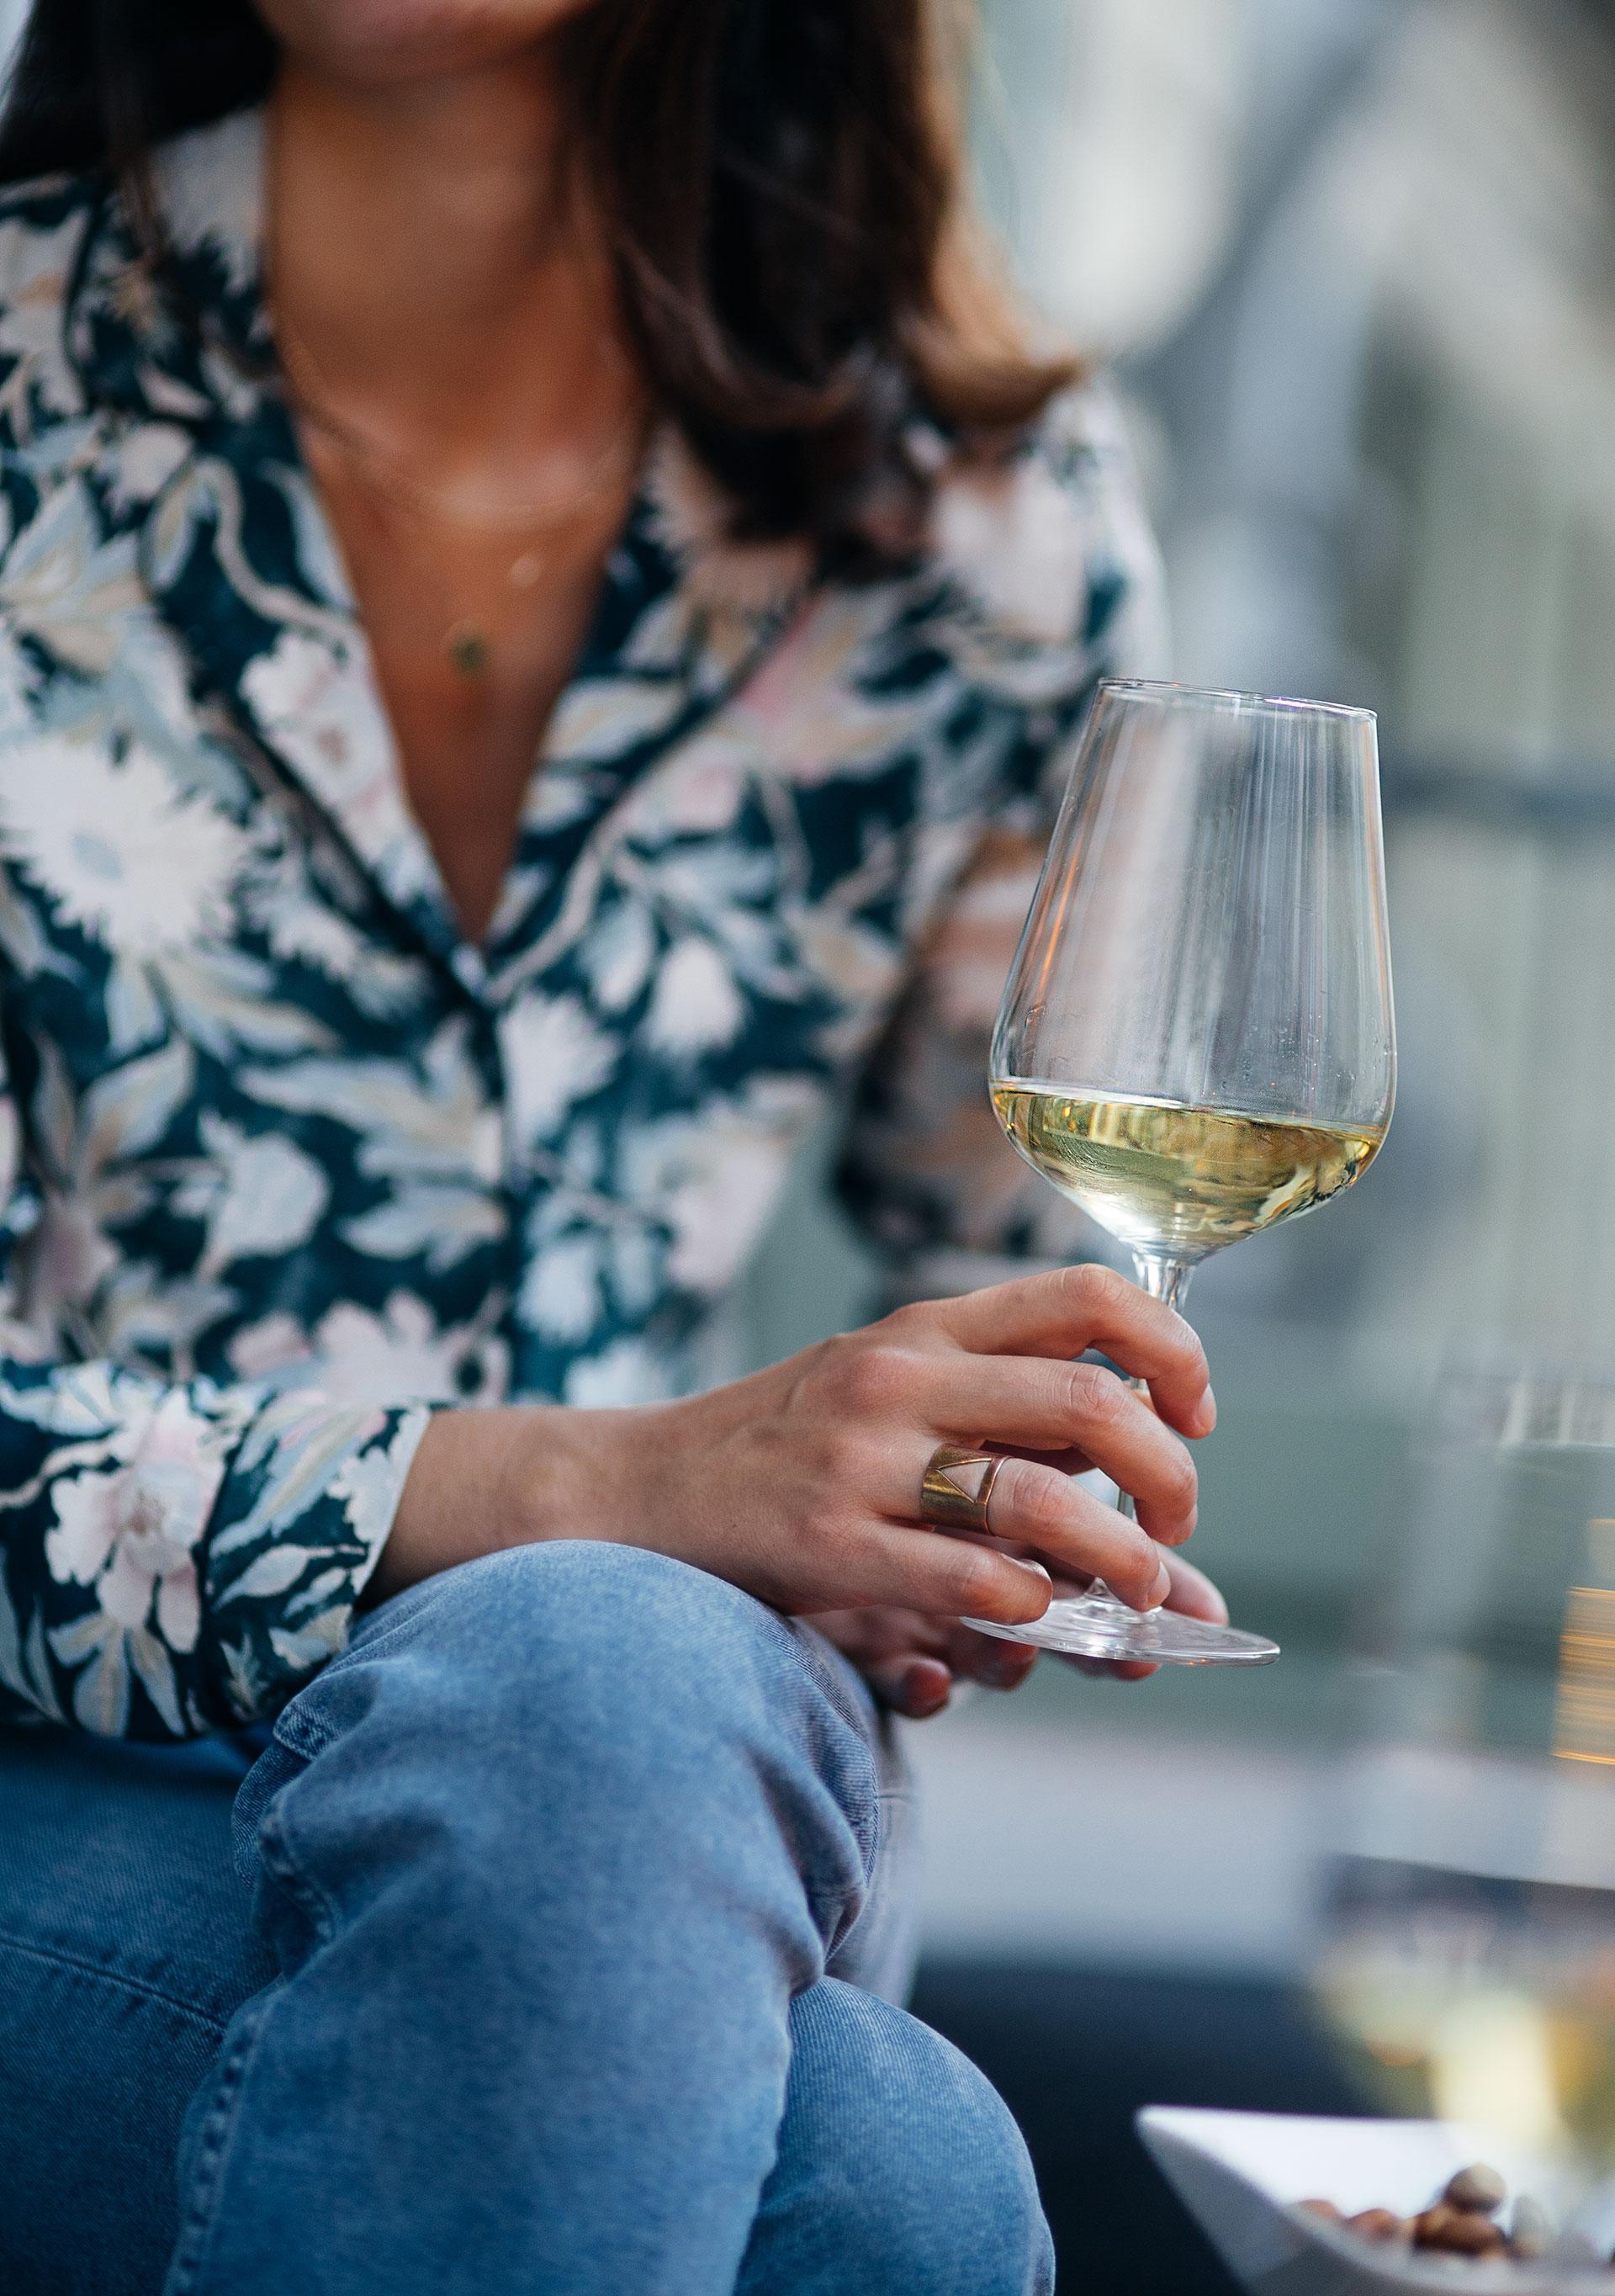 DSTN-photos-lifestyle-wine.jpg